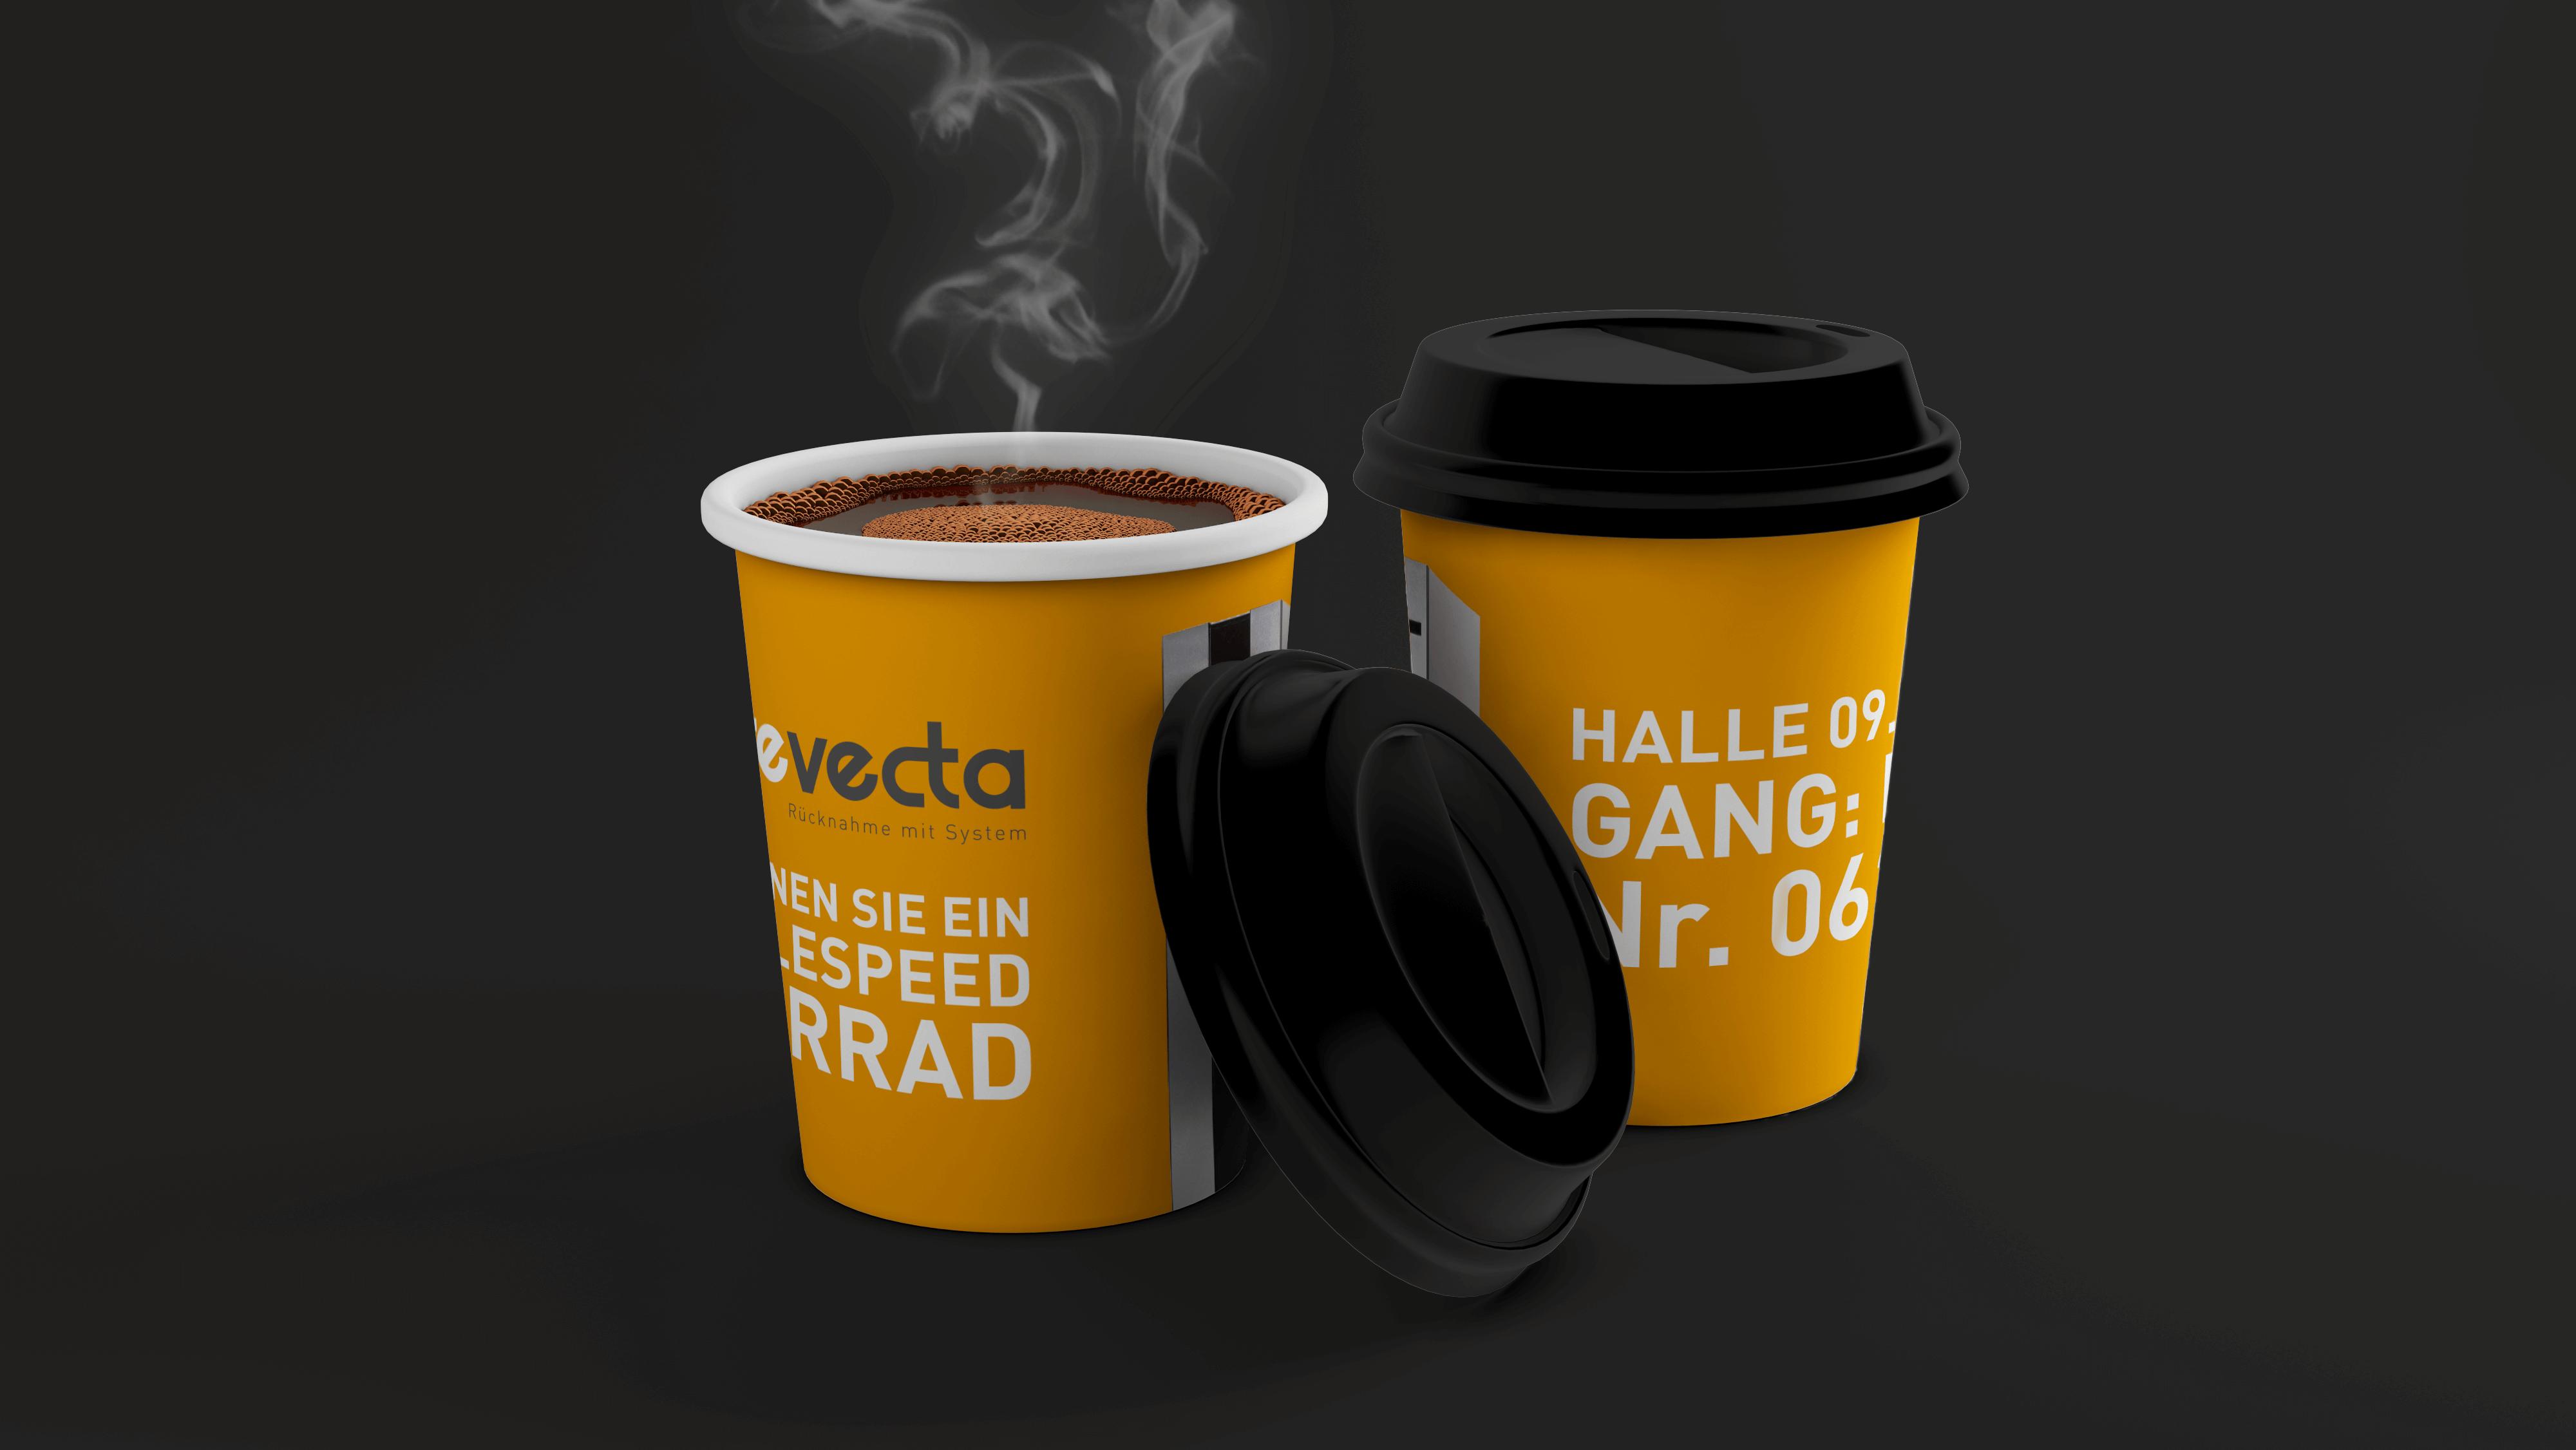 revecta recycling Kaffebecher Pappe